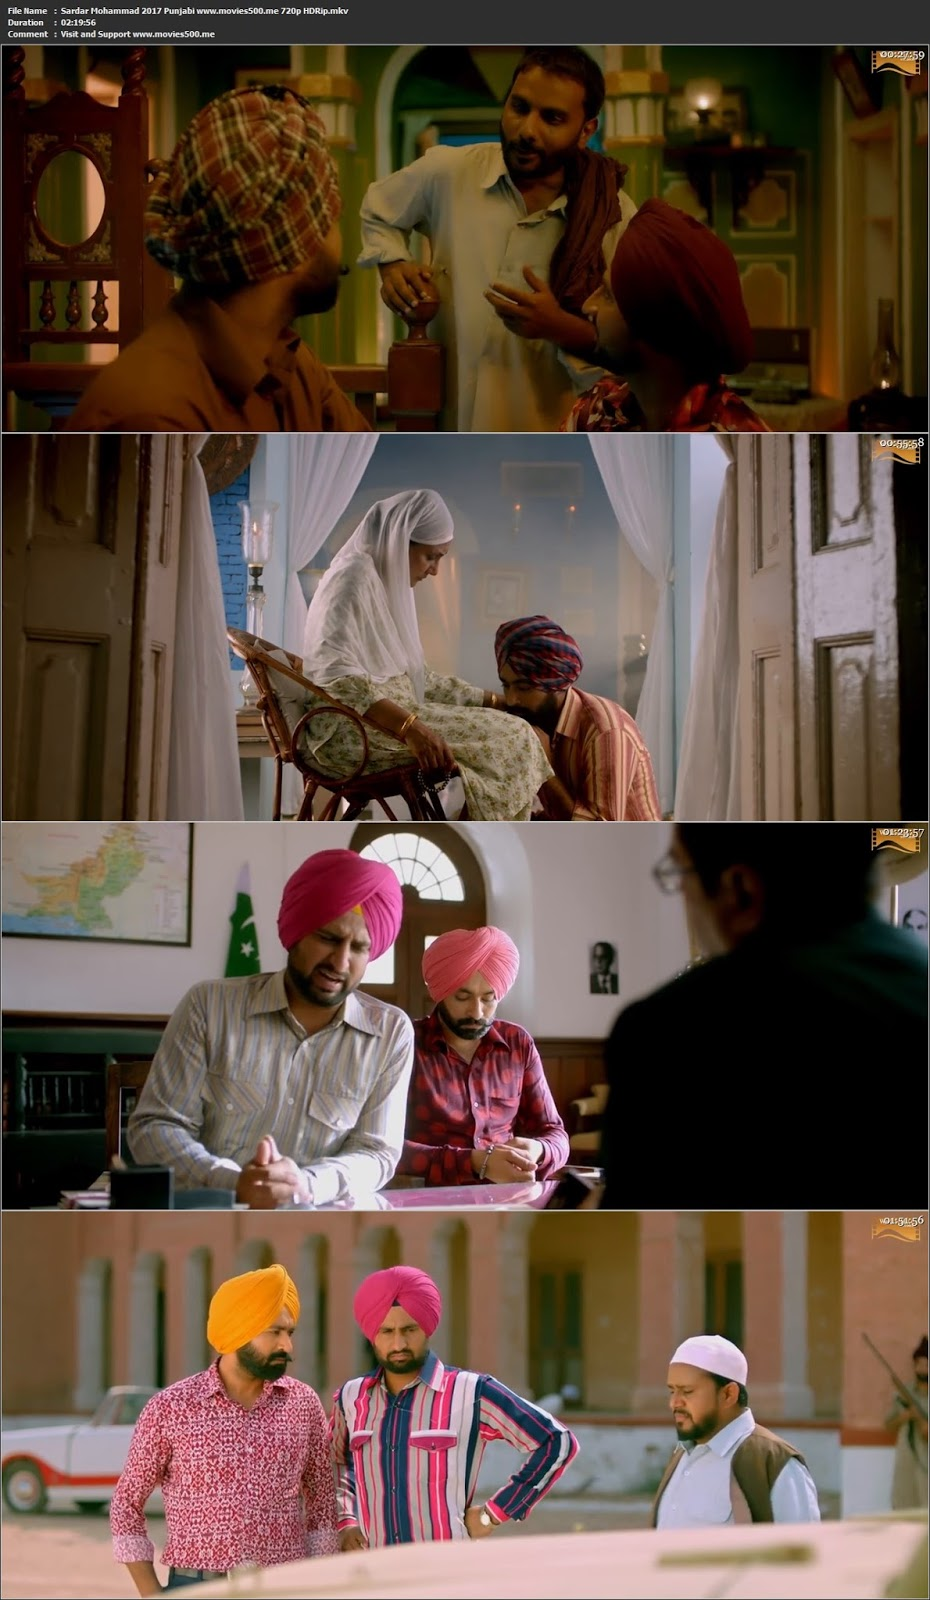 Sardar Mohammad 2017 Punjabi Full Movie HDRip 720p at 9966132.com